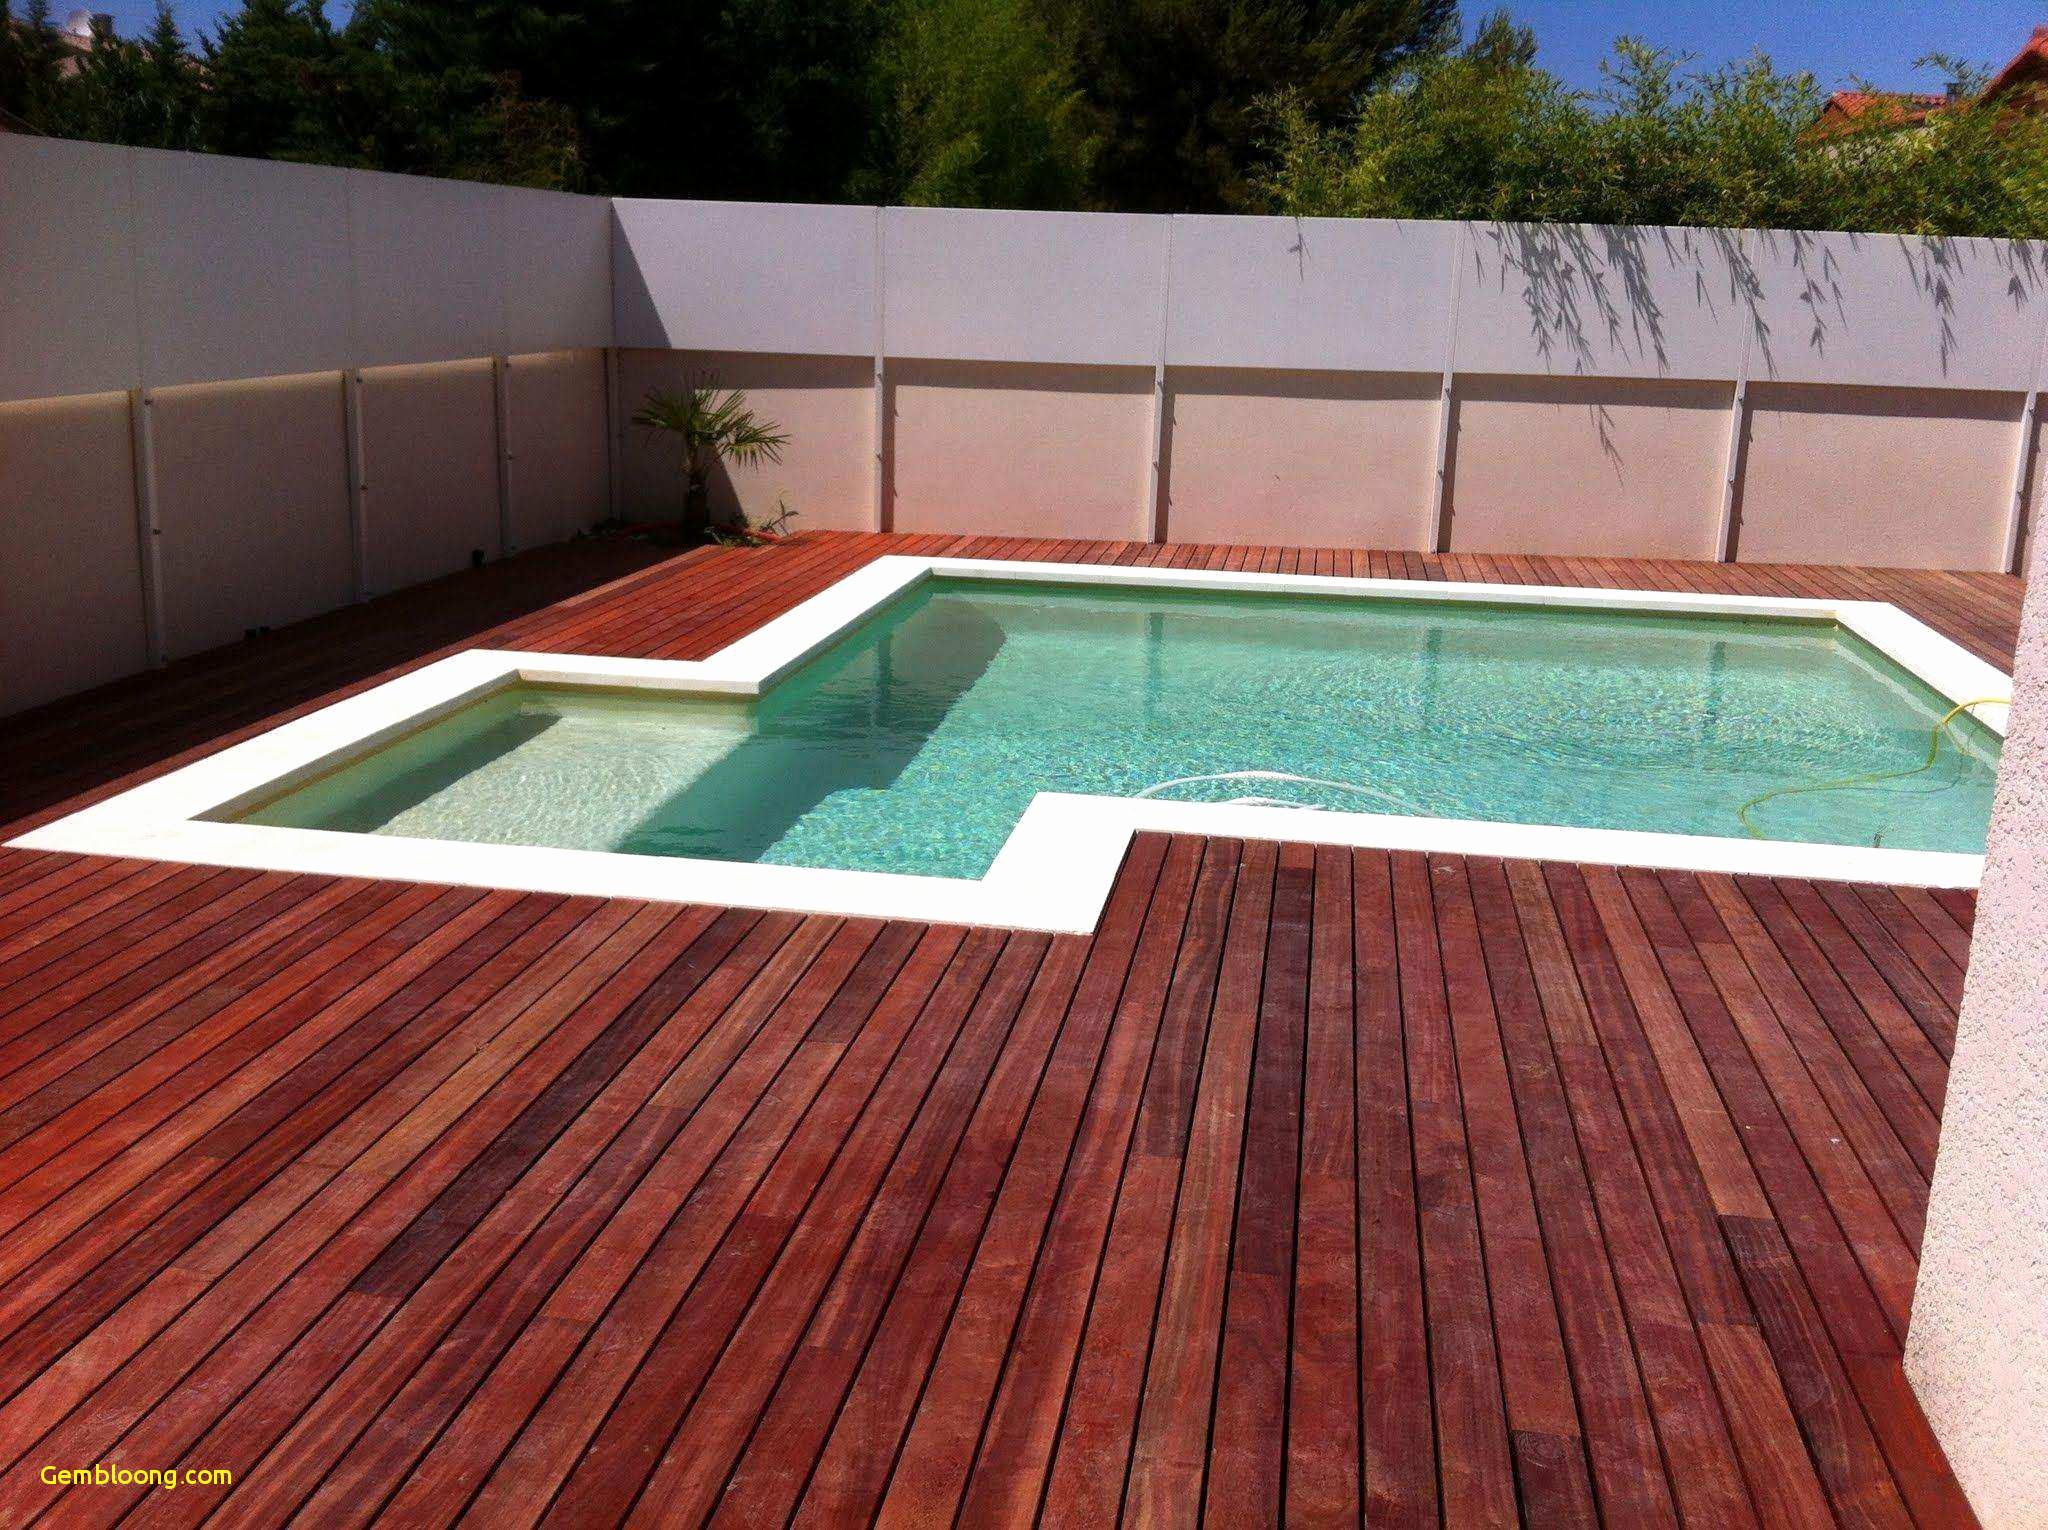 idee deco terrasse pas cher beau amenagement terrasse bois jardin elegant idee deco terrasse bois of idee deco terrasse pas cher